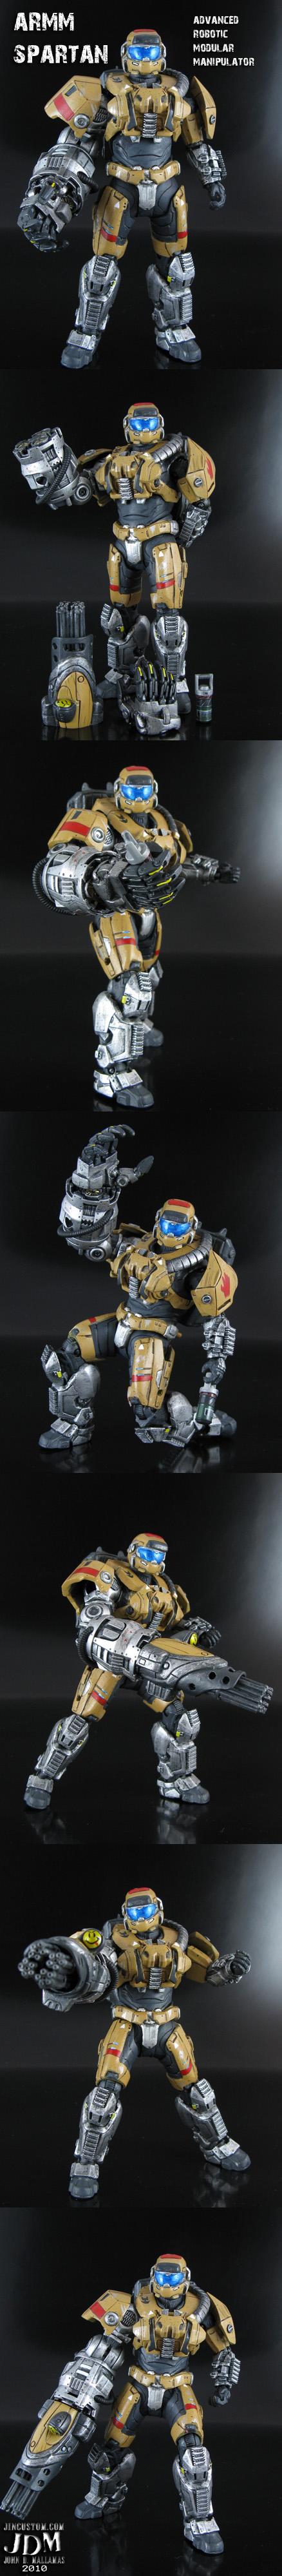 ARMM Spartan